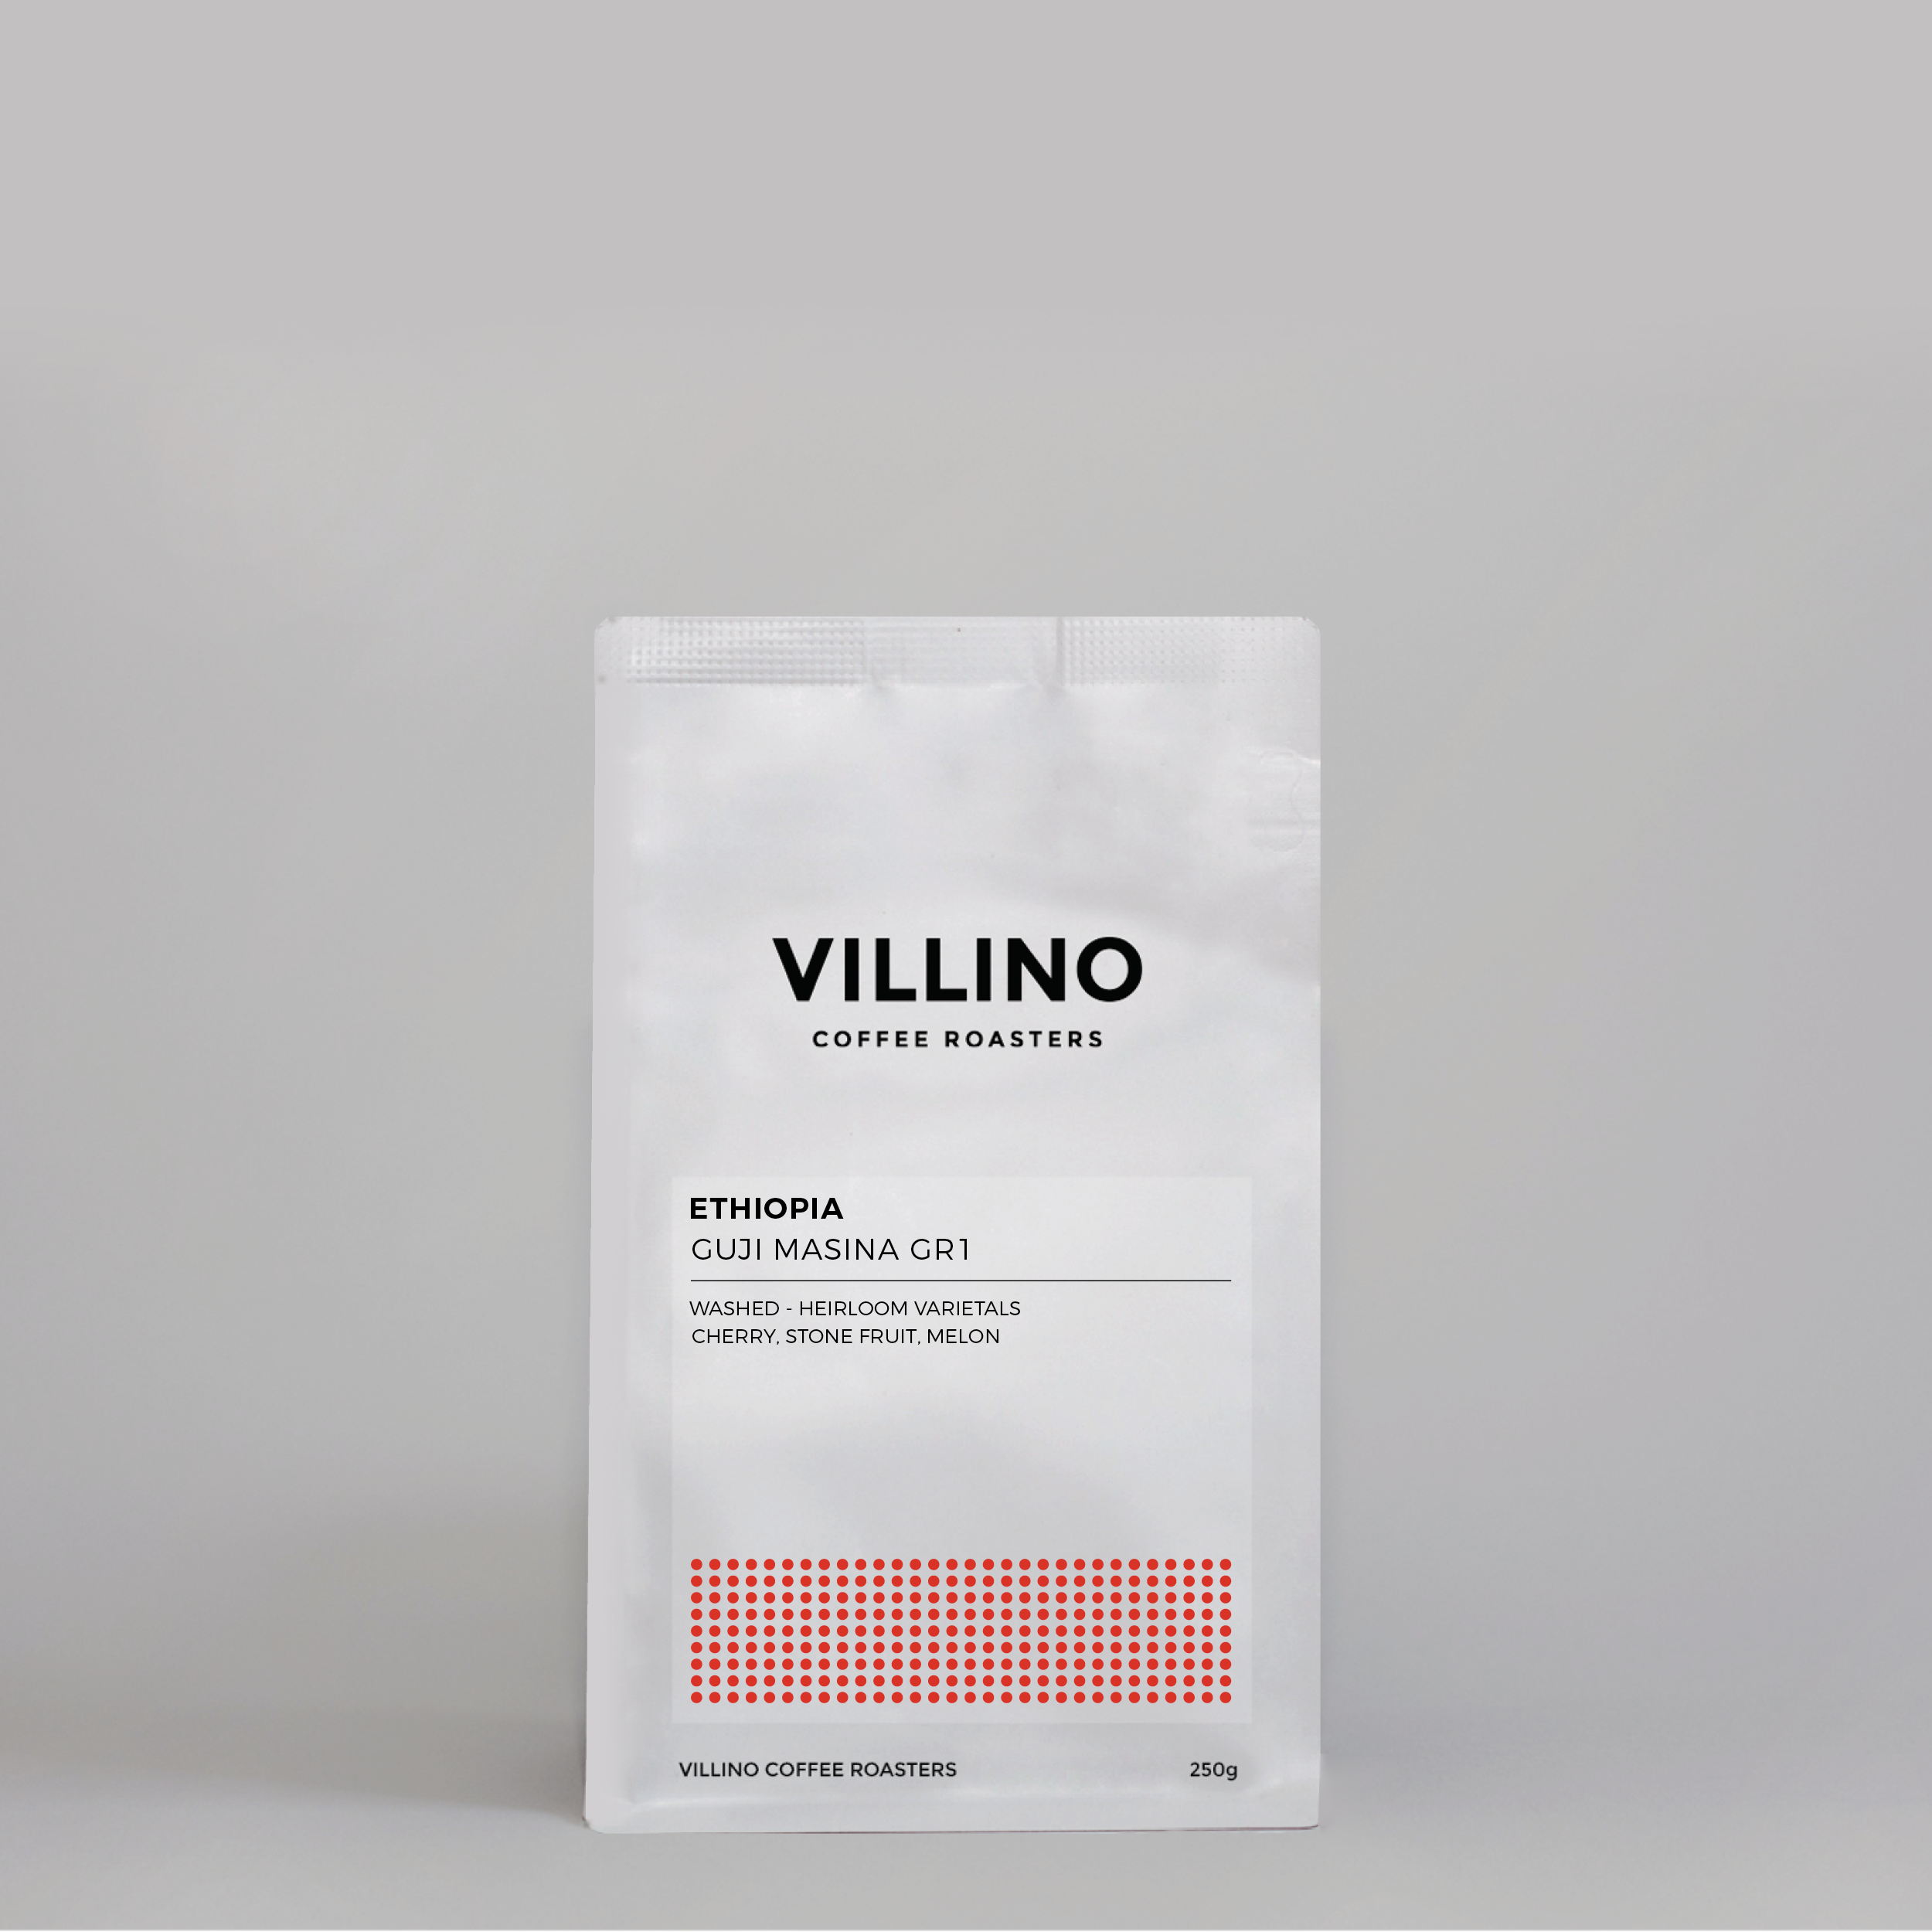 Villino_Retail Bag Templates_600x600px_Ethiopia Guji Masina Gr1.png